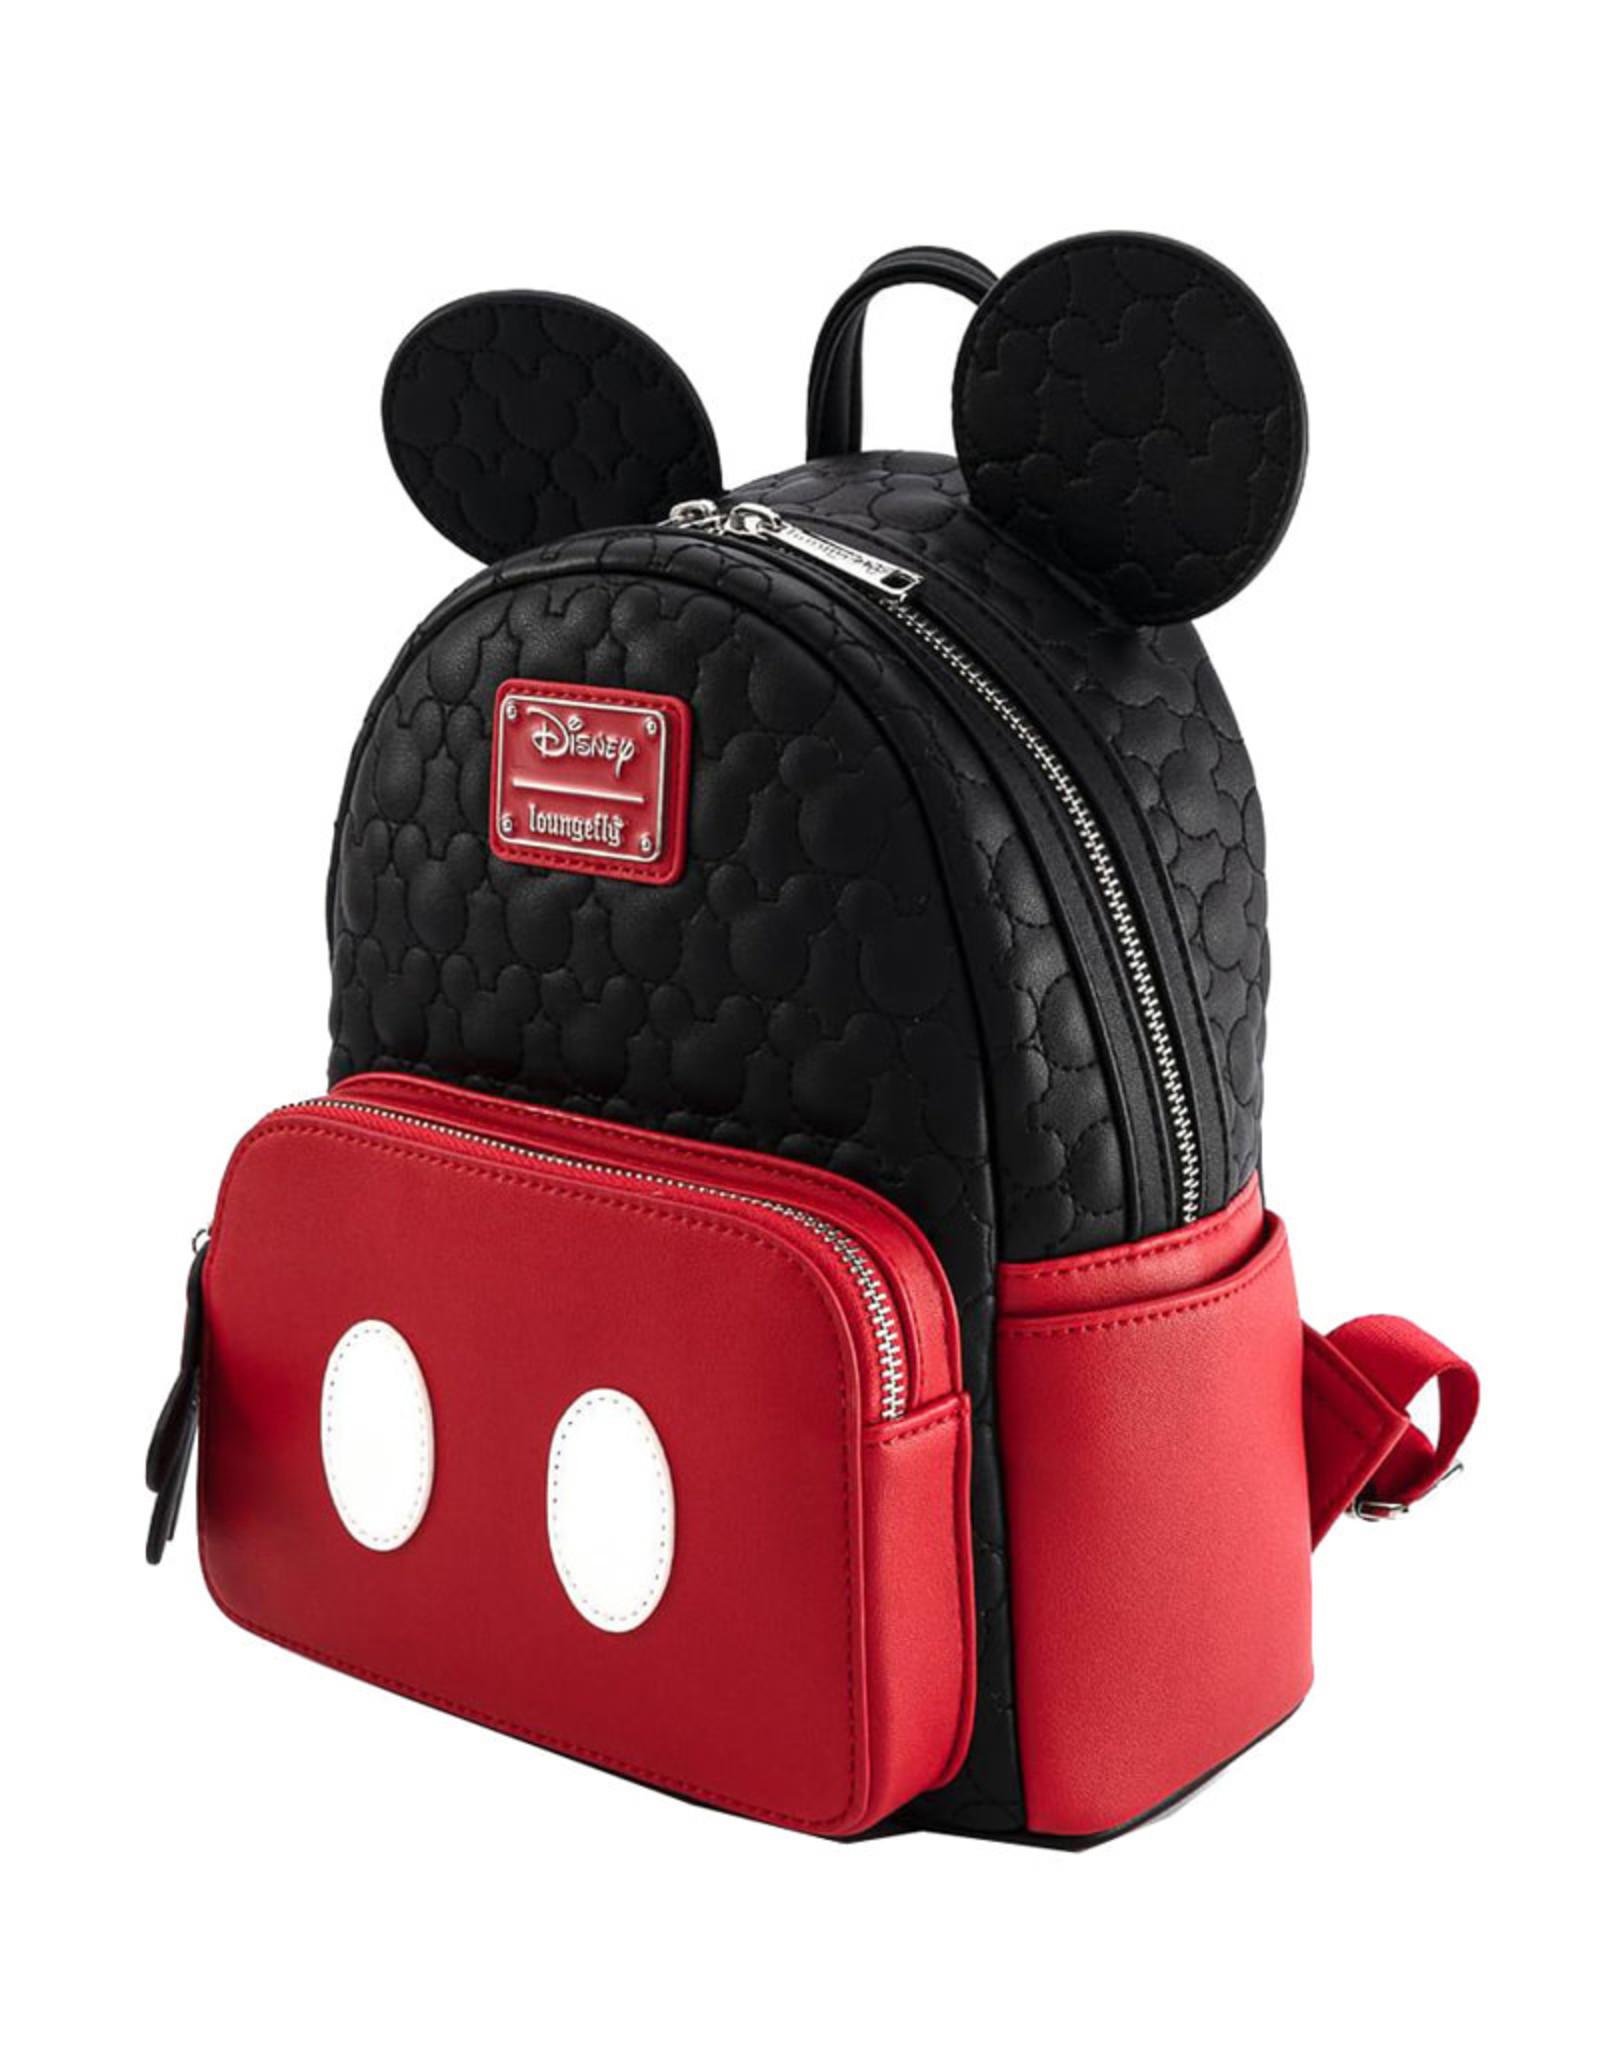 Disney Disney ( Loungefly Mini Backpack ) Mickey Mouse OH BOY !